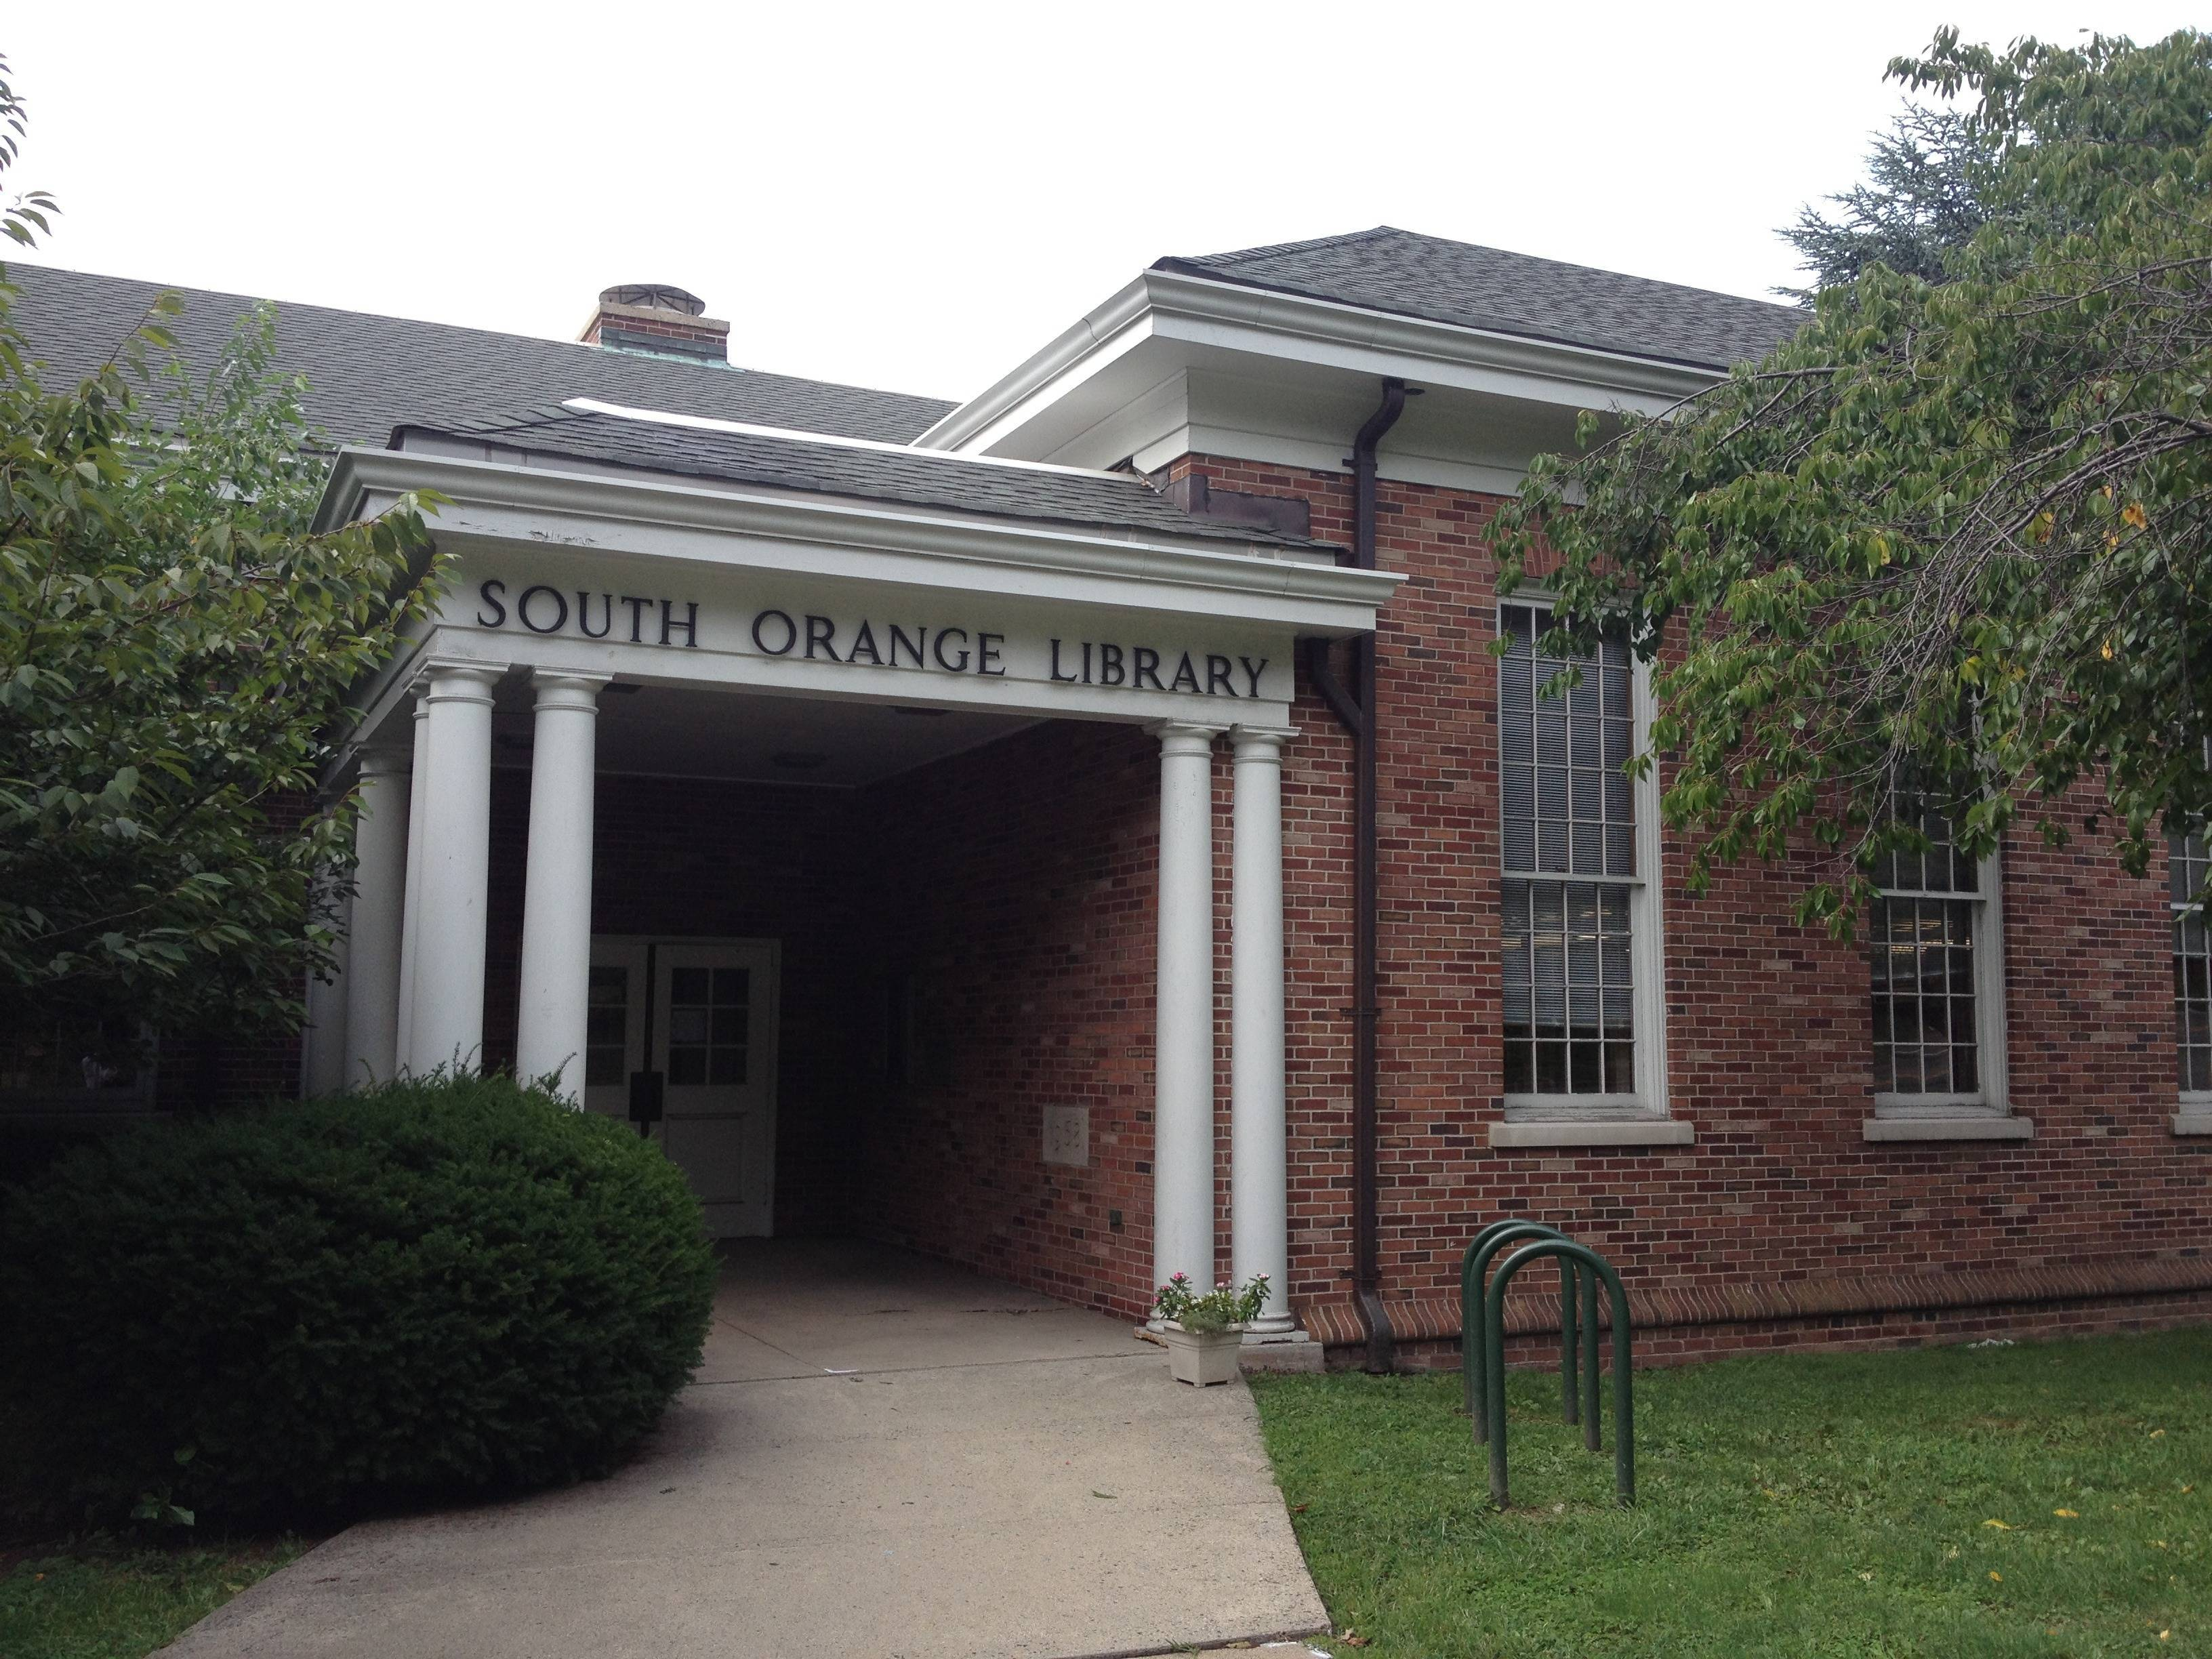 466c6a162e56682b4a15_South_Orange_Library.JPG